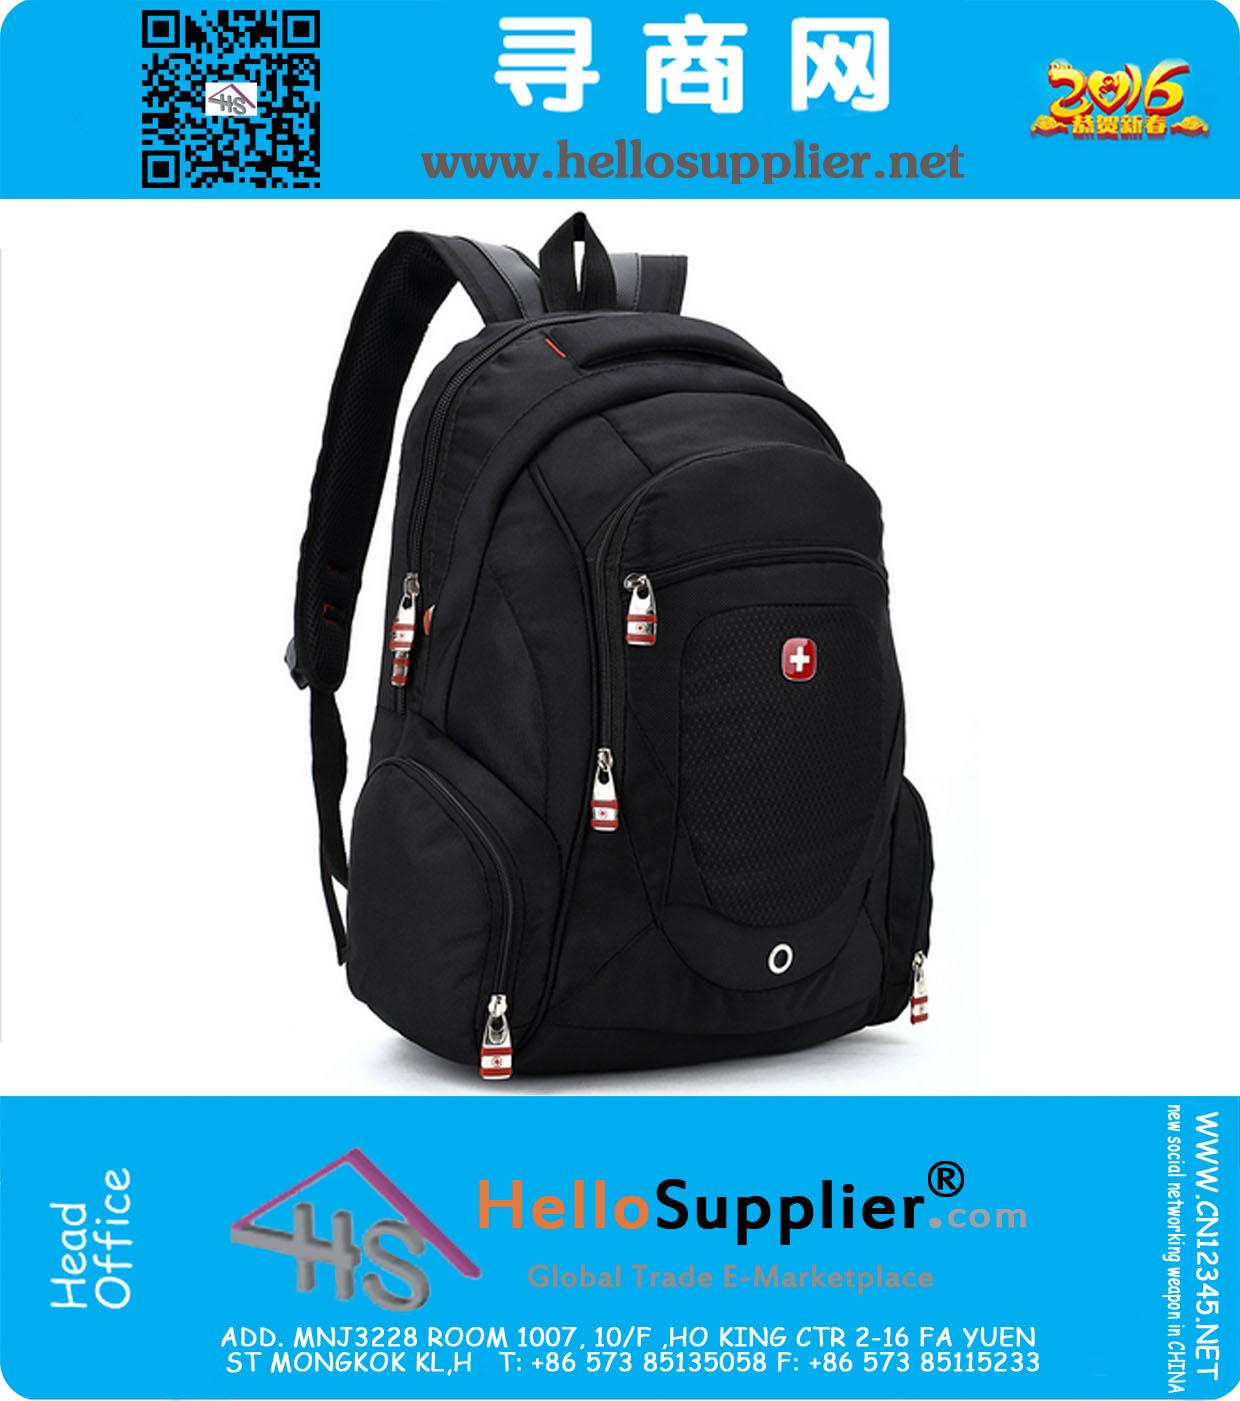 Swiss Gear Laptop Waterproof Business Computer Backpack Bag ... 60deea98256af